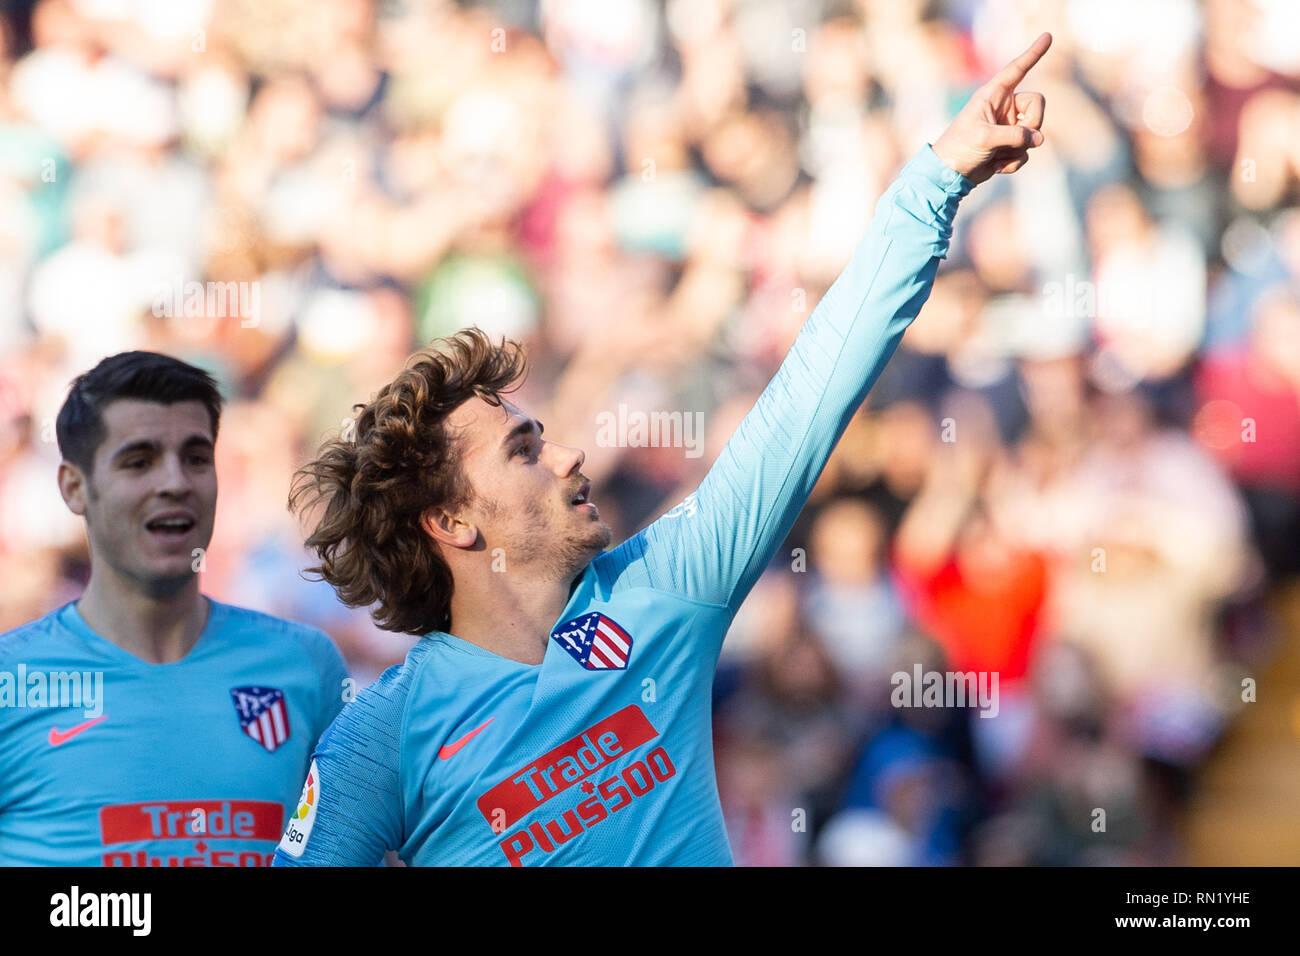 Antoine Griezmann of Atletico Madrid during the match between Rayo Vallecano vs Atletico Madrid of La Liga, date 24, 2018-2019 season. Stadium of Vallecas,  Madrid, Spain - 16  FEB 2019. - Stock Image